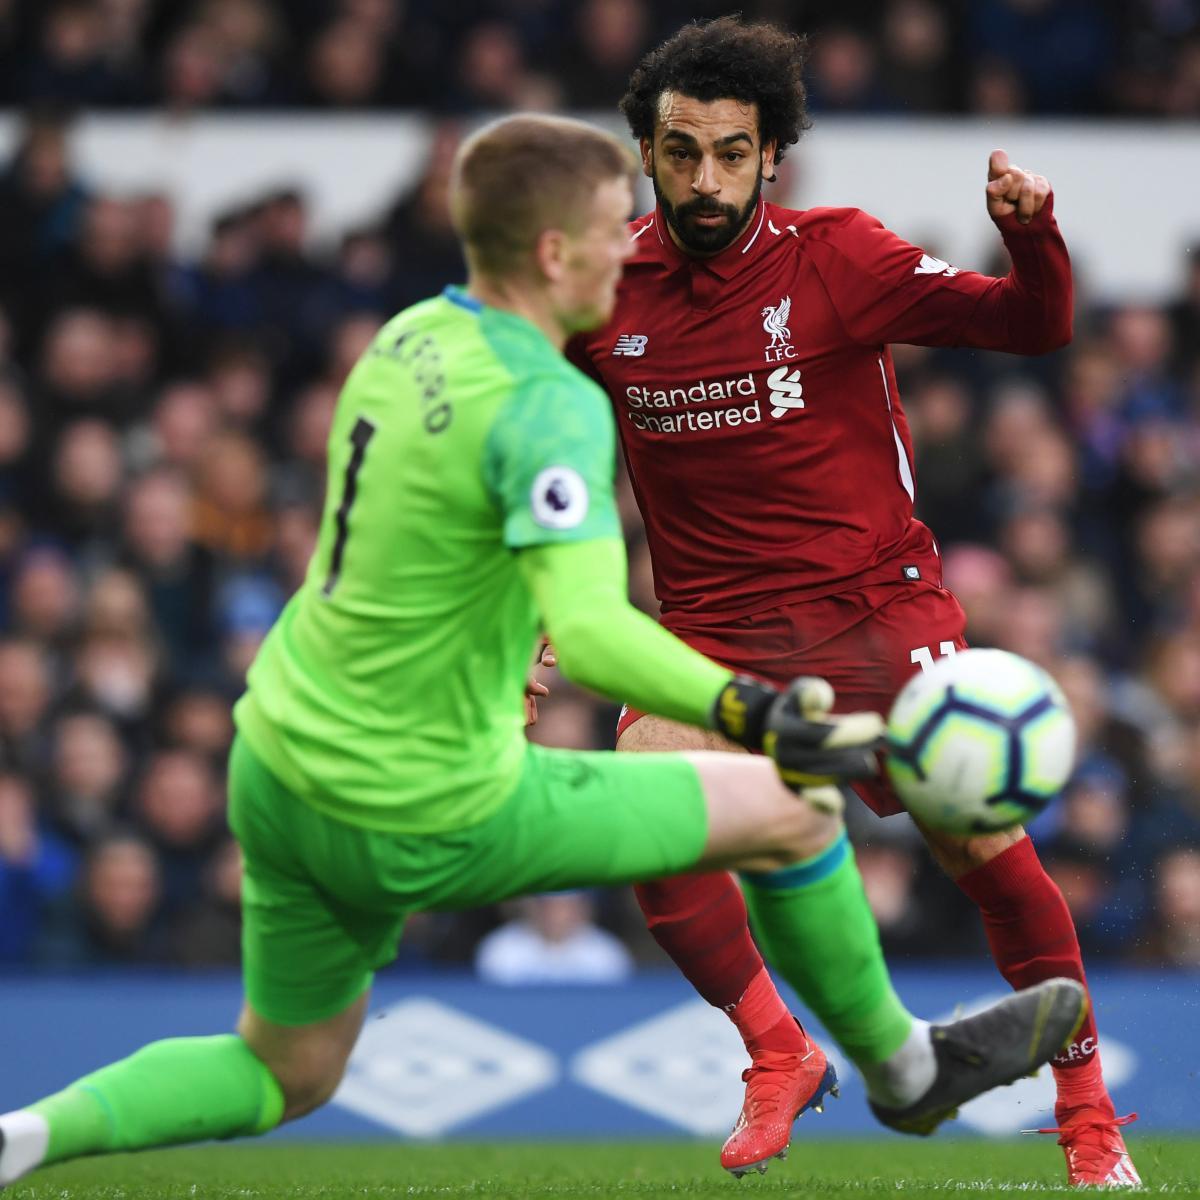 Liverpool News When Did The Premier League S Finest: Liverpool Fail To Go Top Of Premier League After Goalless